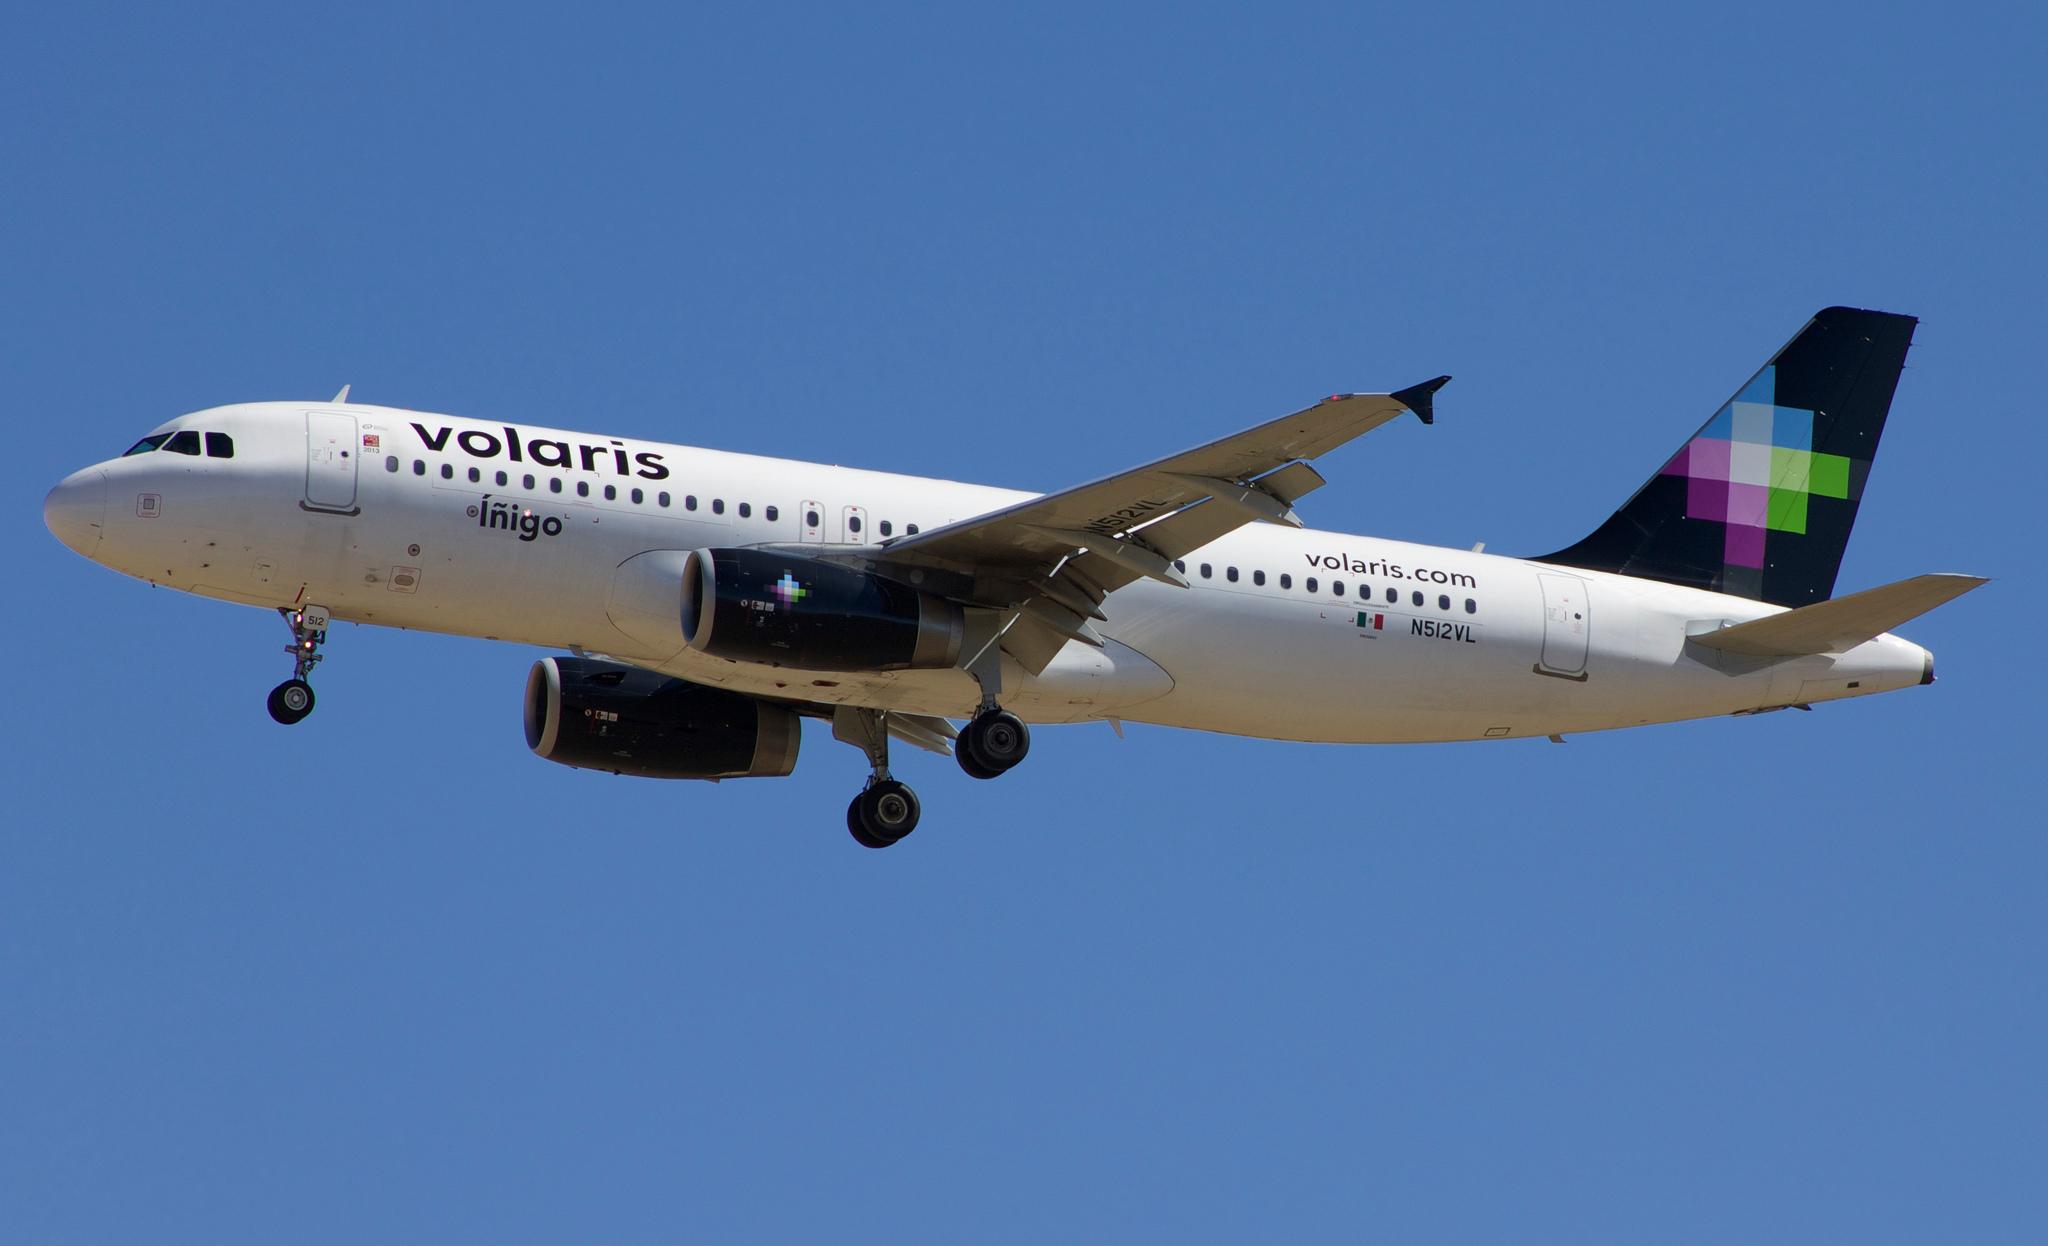 A Volaris plane.